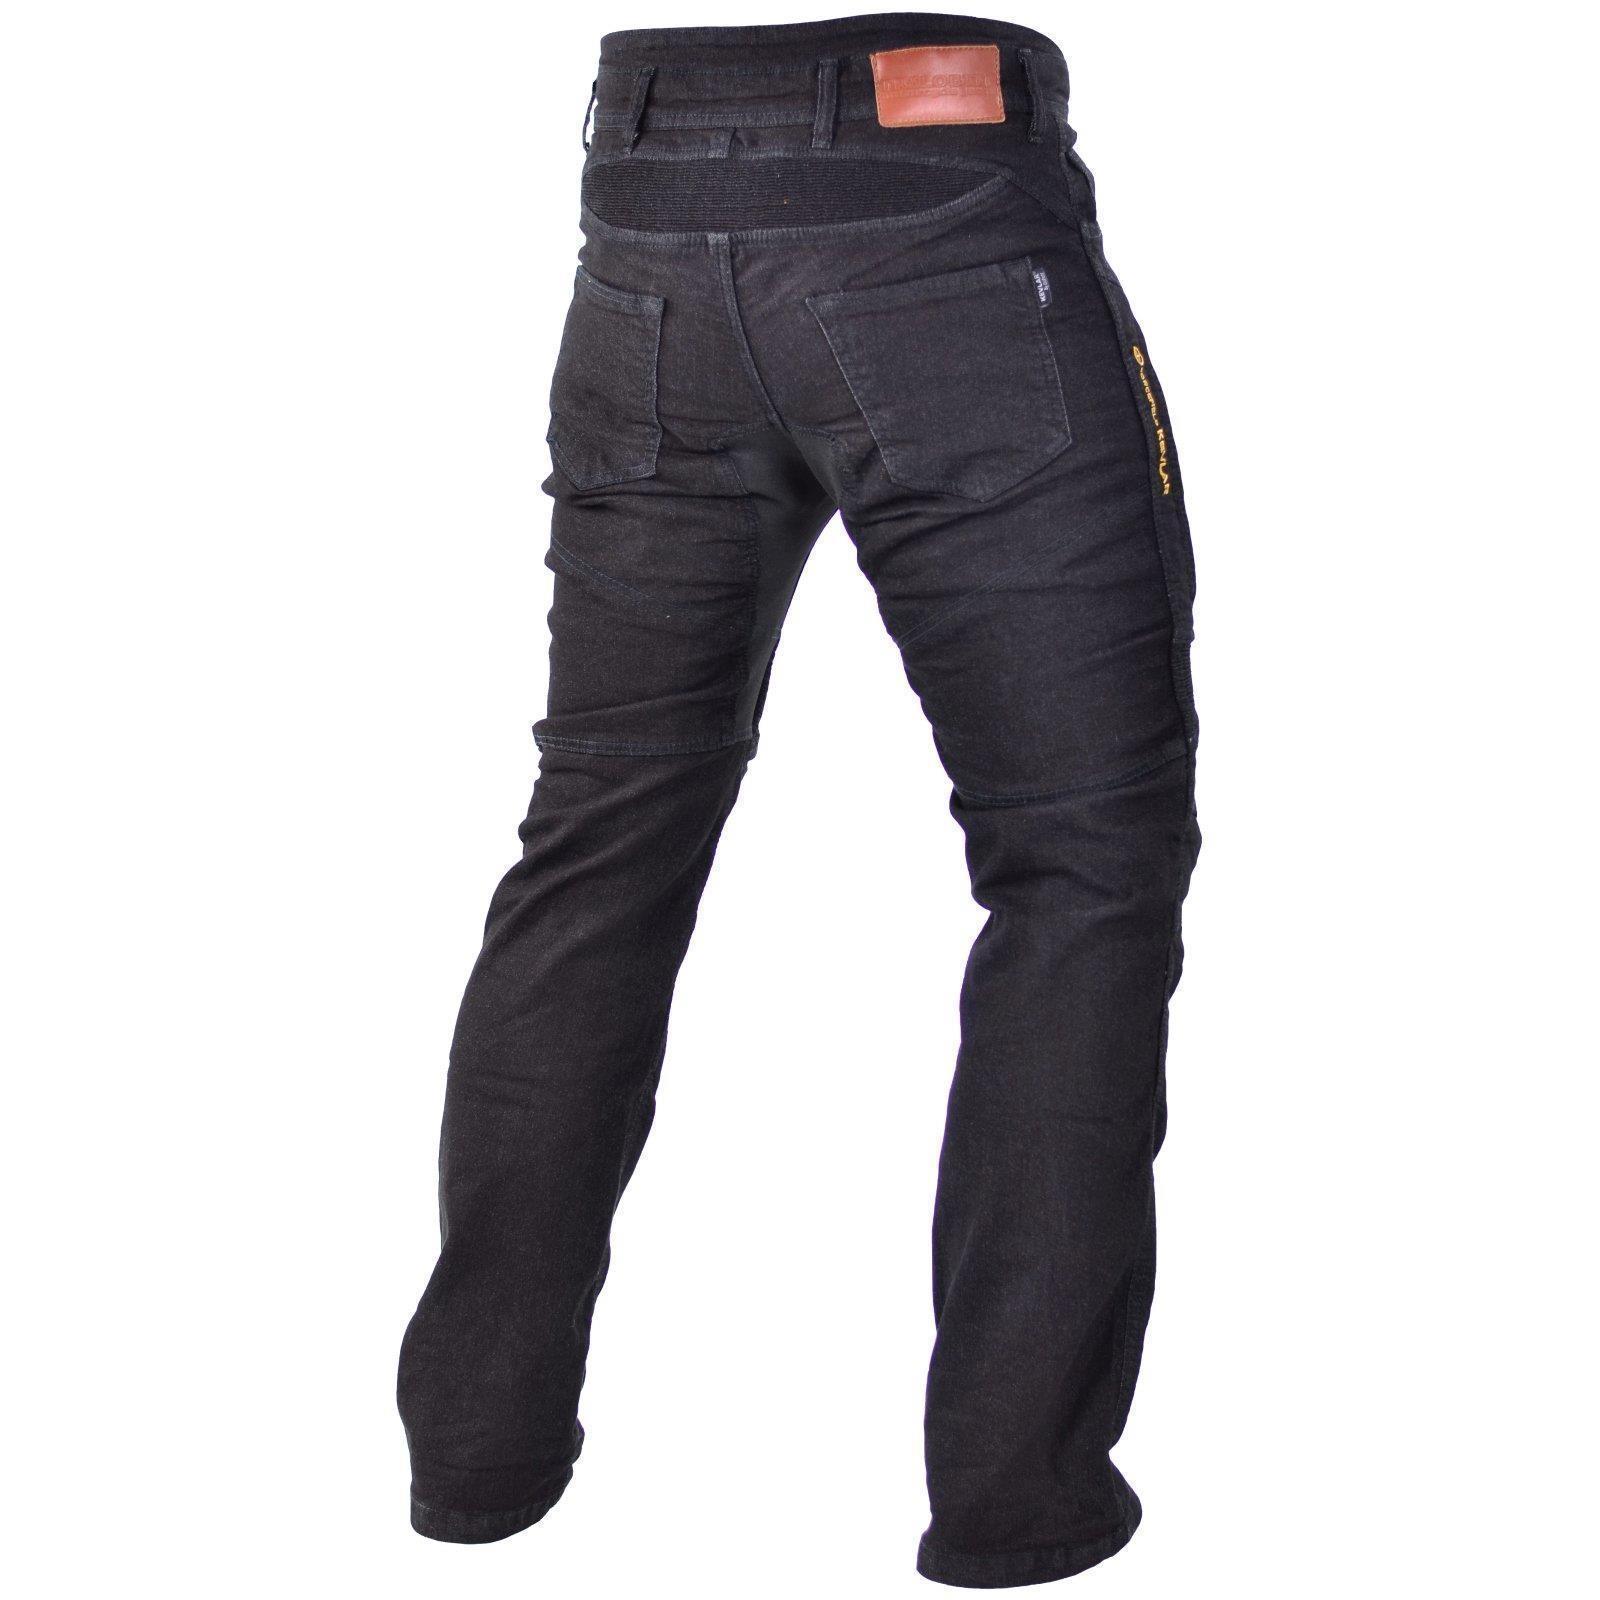 Trilobite Smart Hommes Moto Pantalons STD//Lang-Bleu